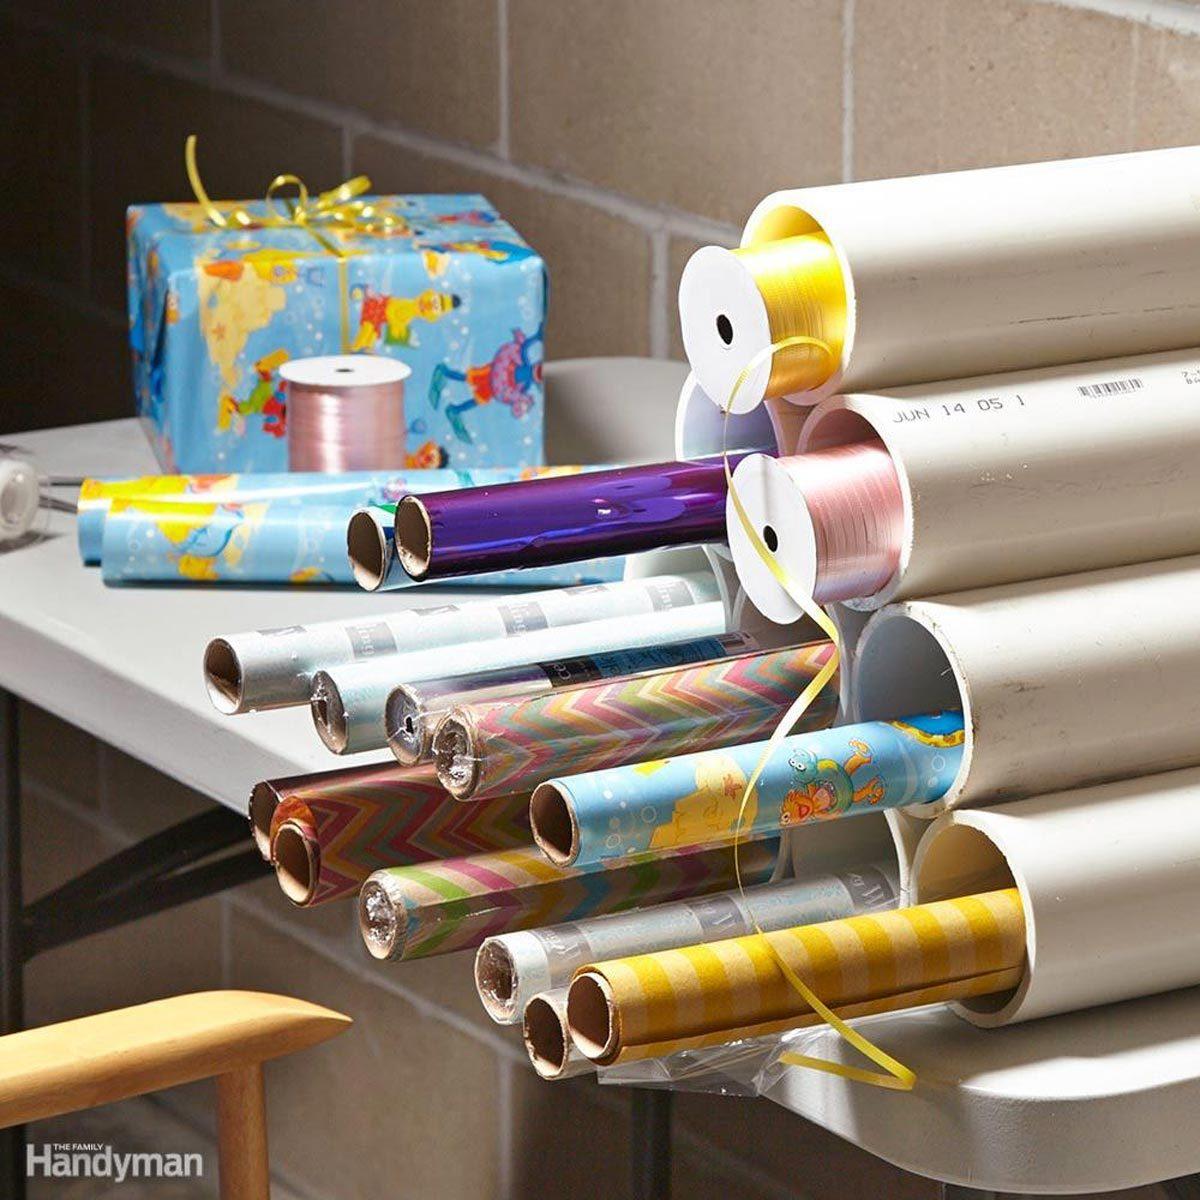 FH14JAU_550_08_006 gift wrap pvc pipe storage